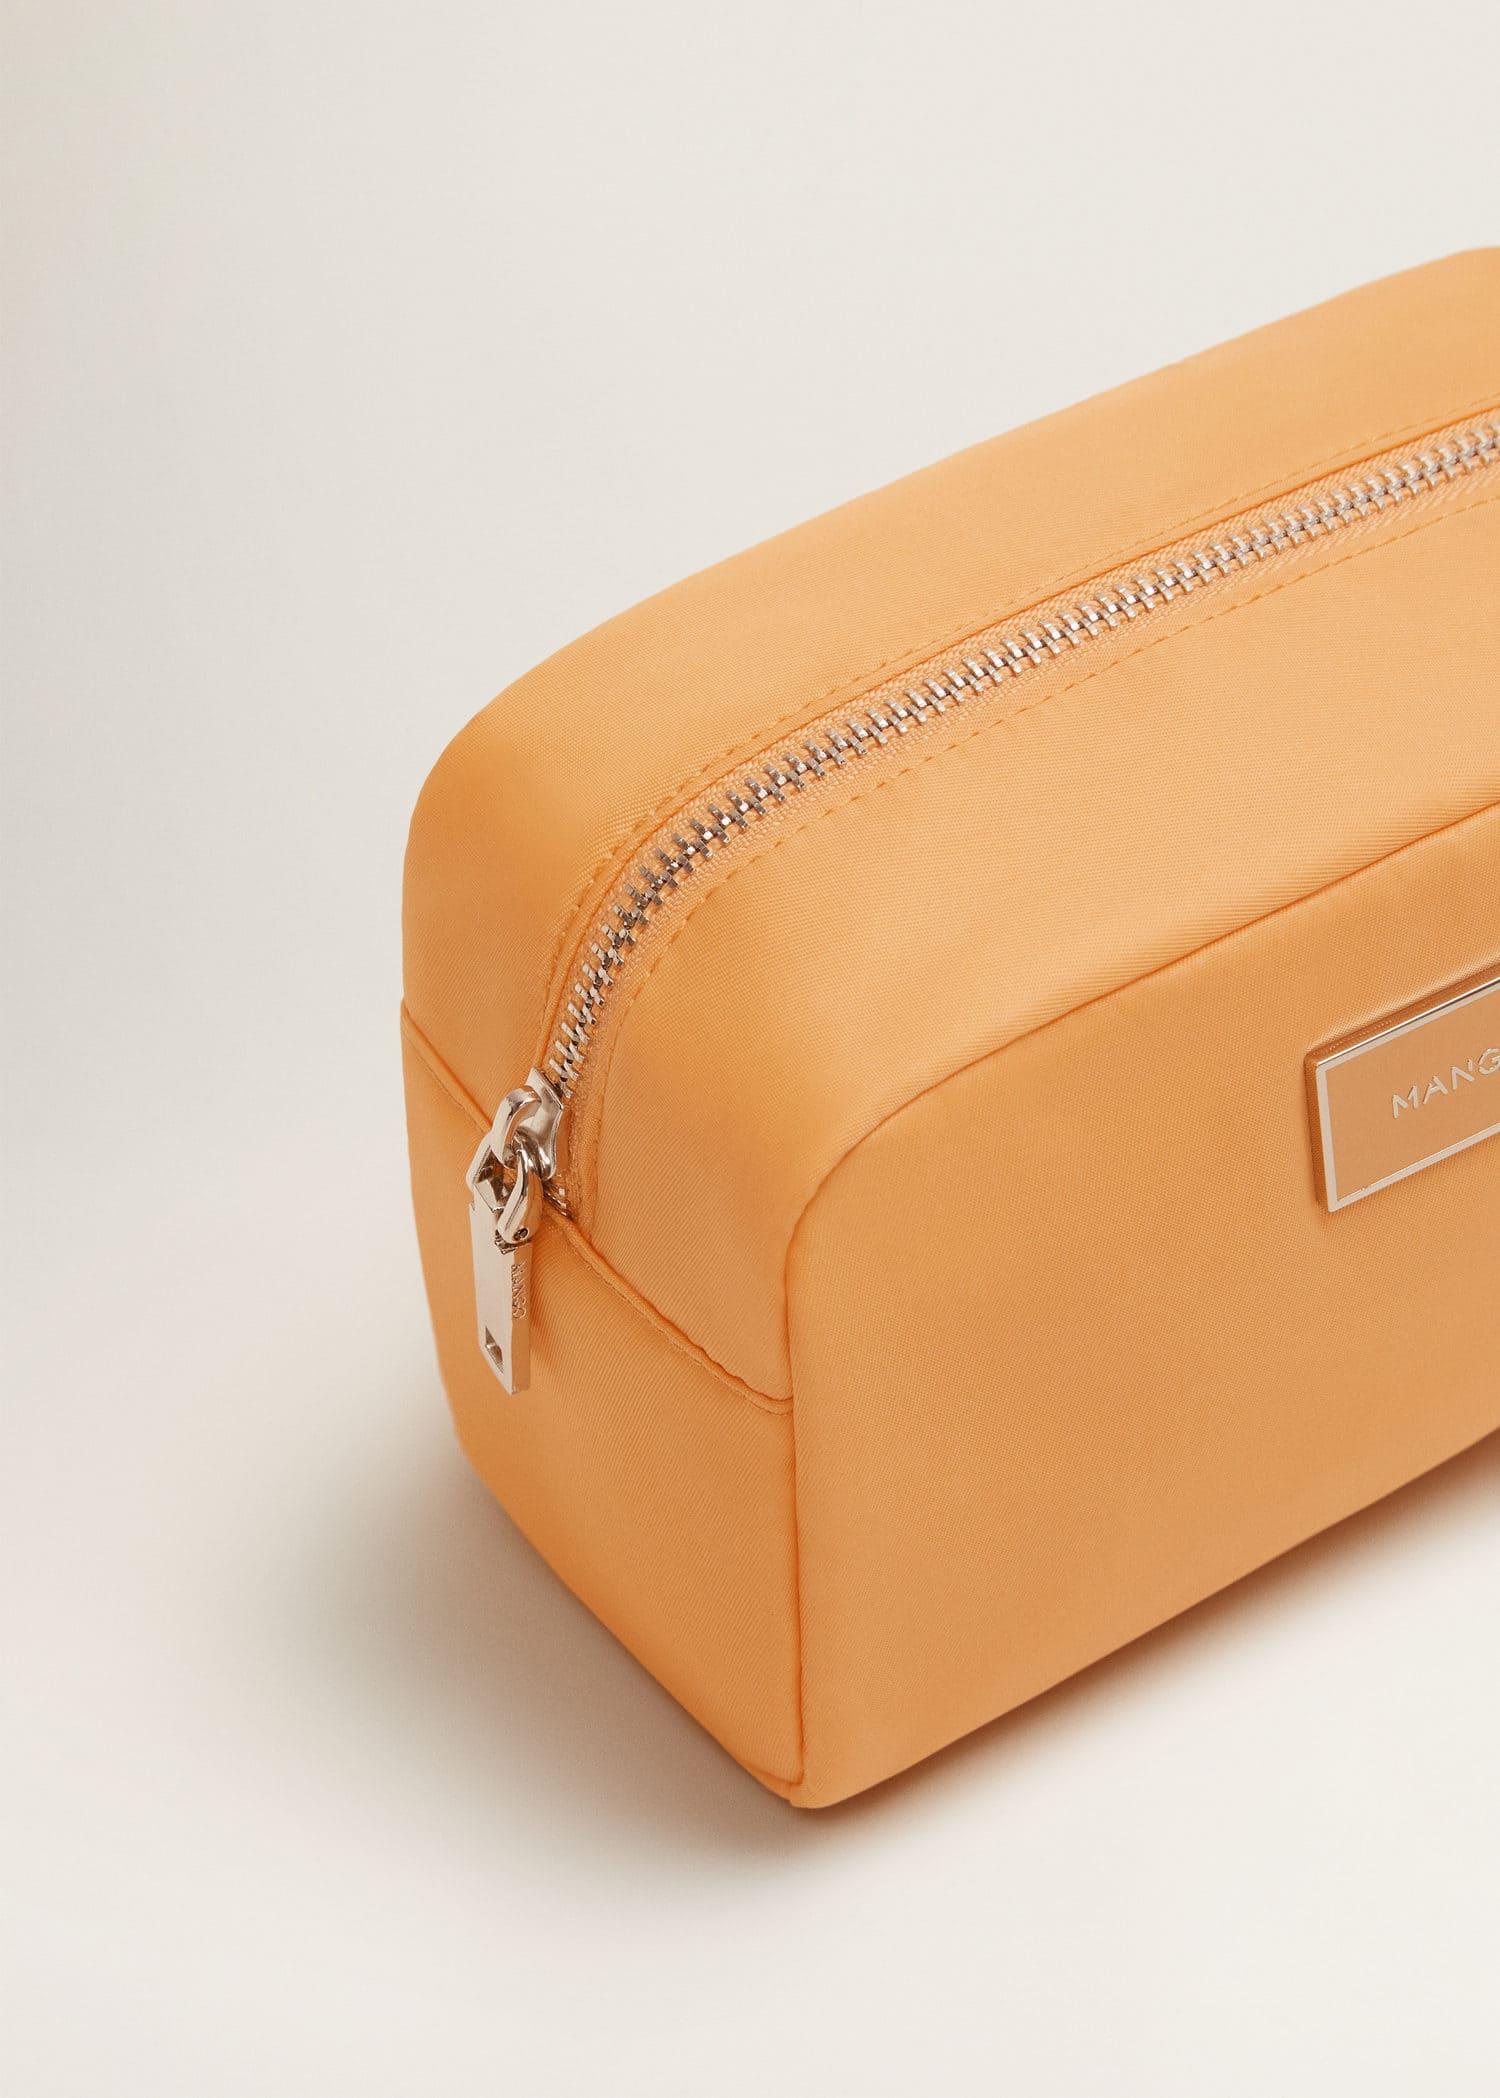 292dbbca0ac59 Mango Fermuarlı kozmetik çanta 1 Mango Fermuarlı kozmetik çanta 3 ...